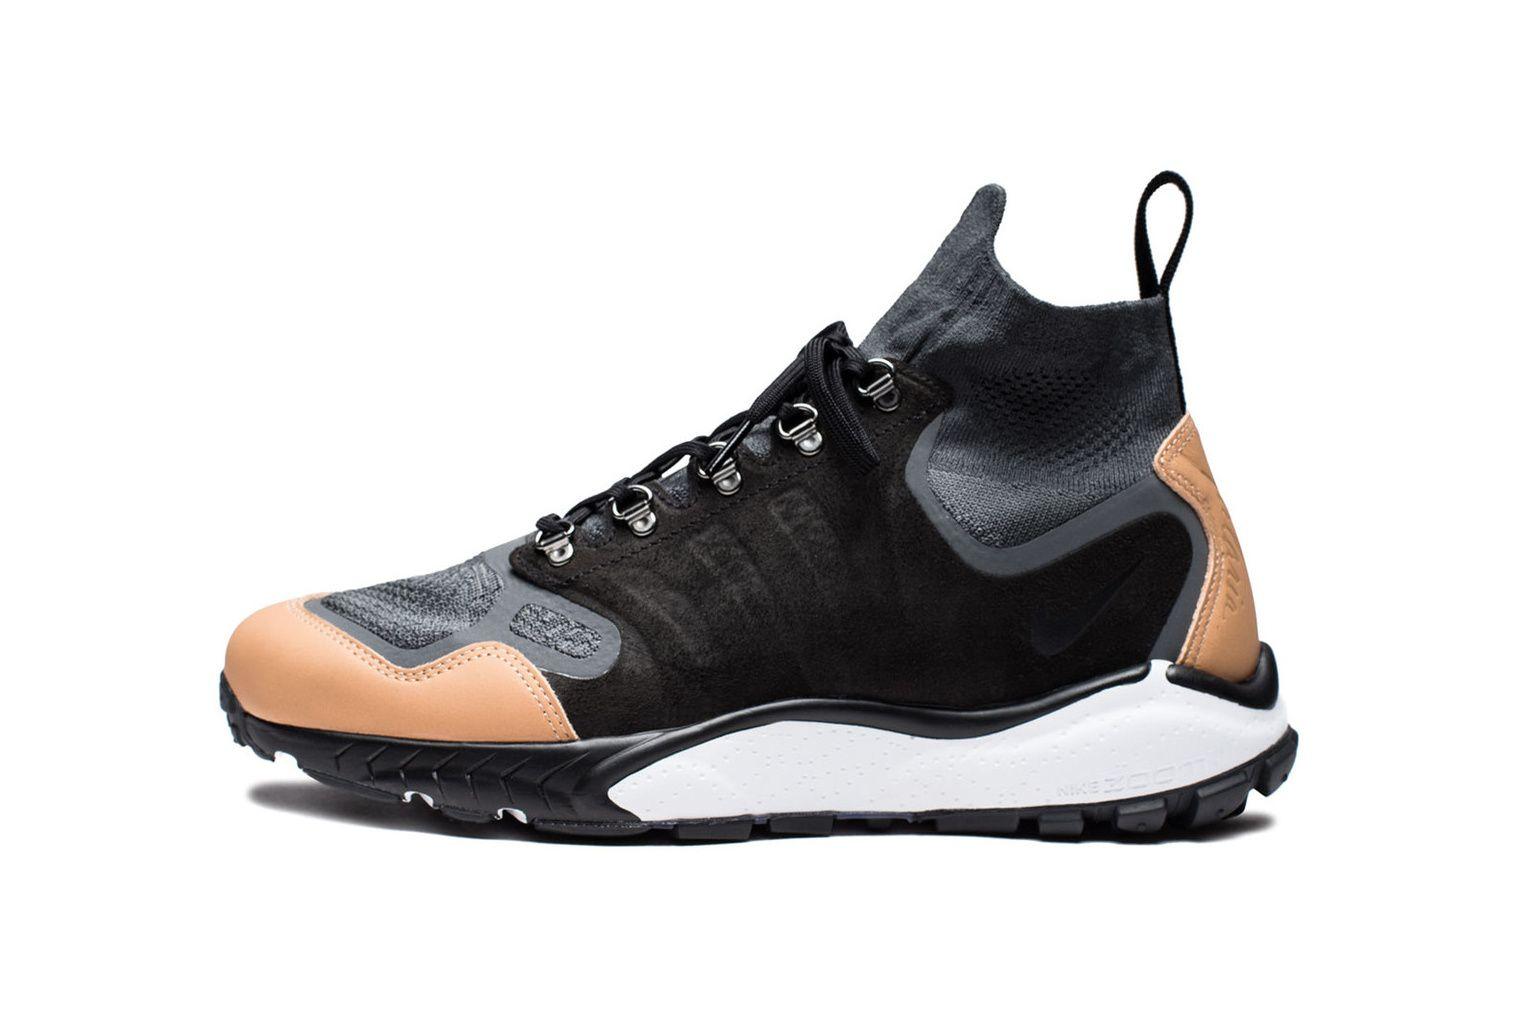 f0c5bf54b767 Nike Air Zoom Talaria Mid Flyknit Anthracite Black Vachetta Tan Dark Grey